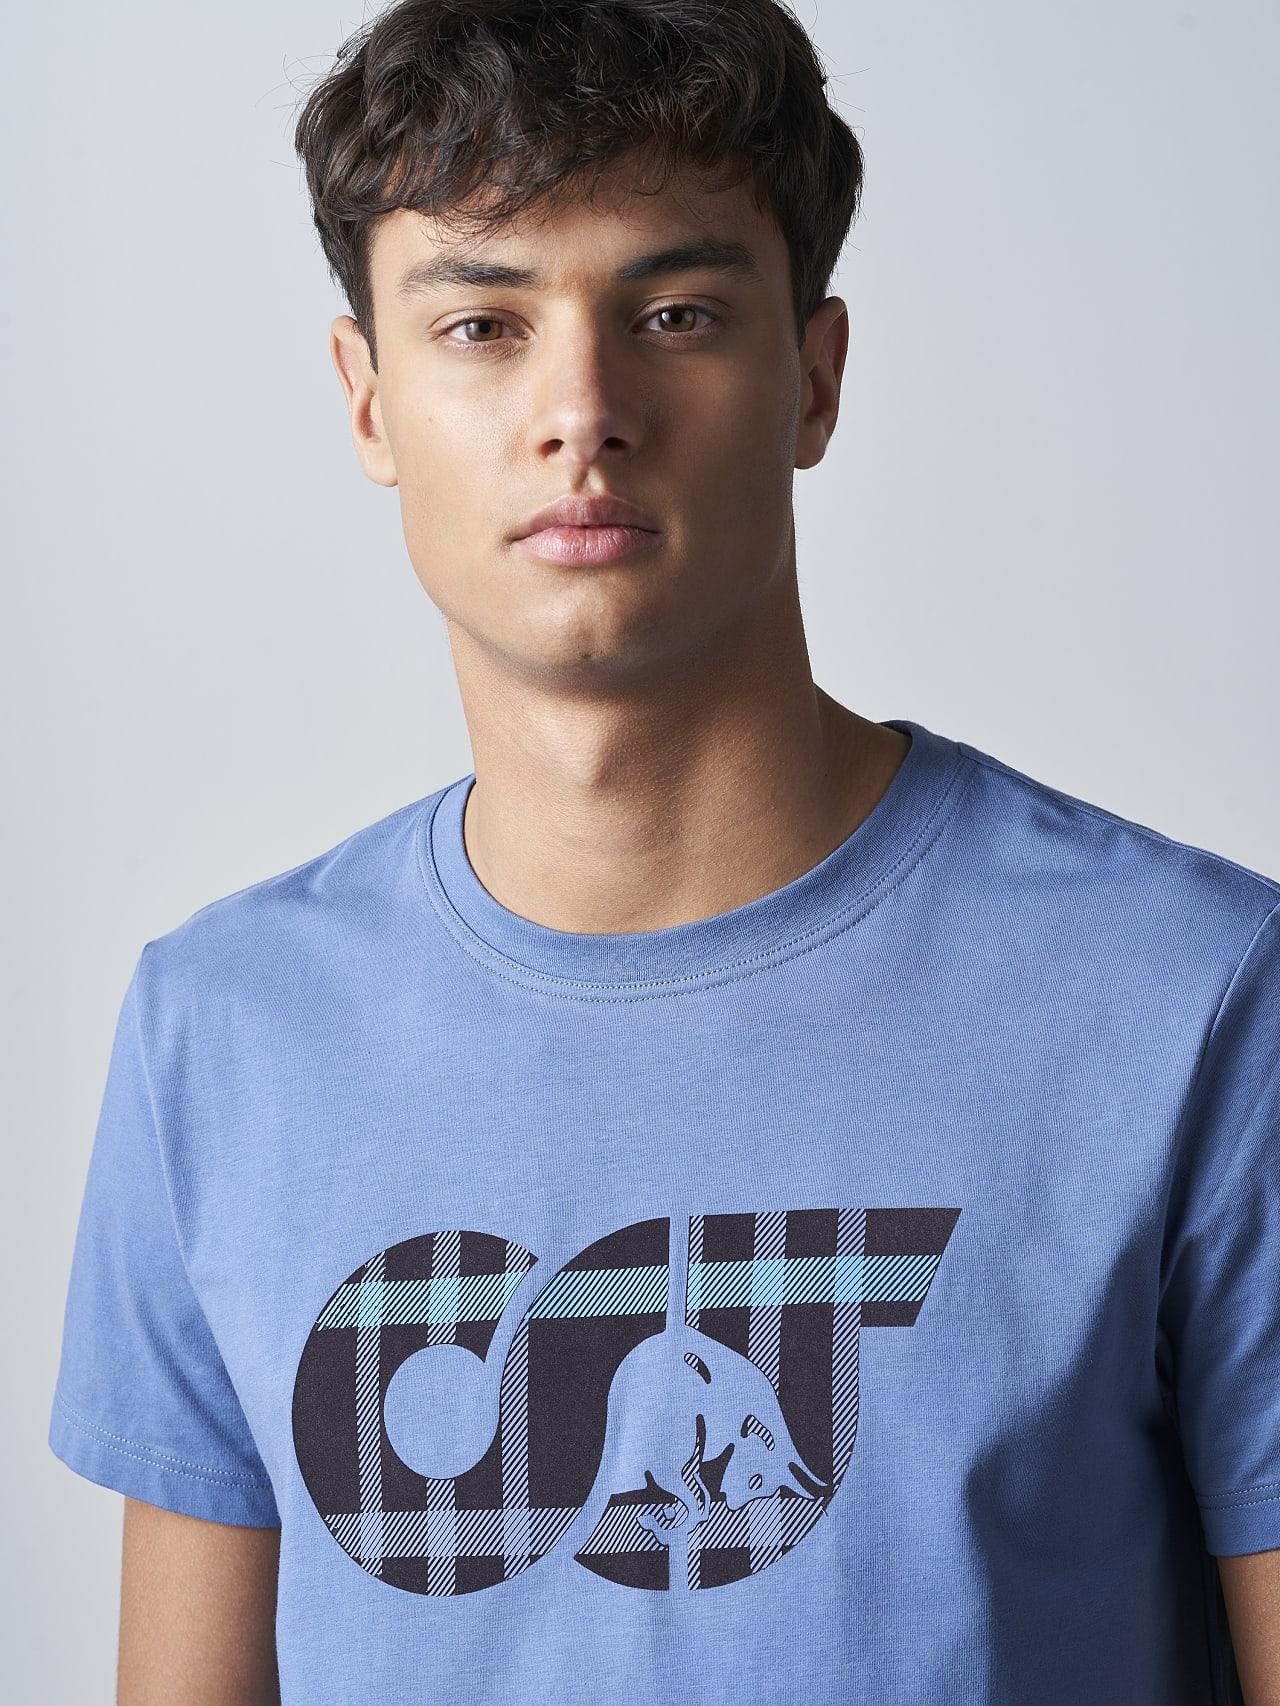 JABIS V1.Y5.02 Logo Print T-Shirt light blue Right Alpha Tauri